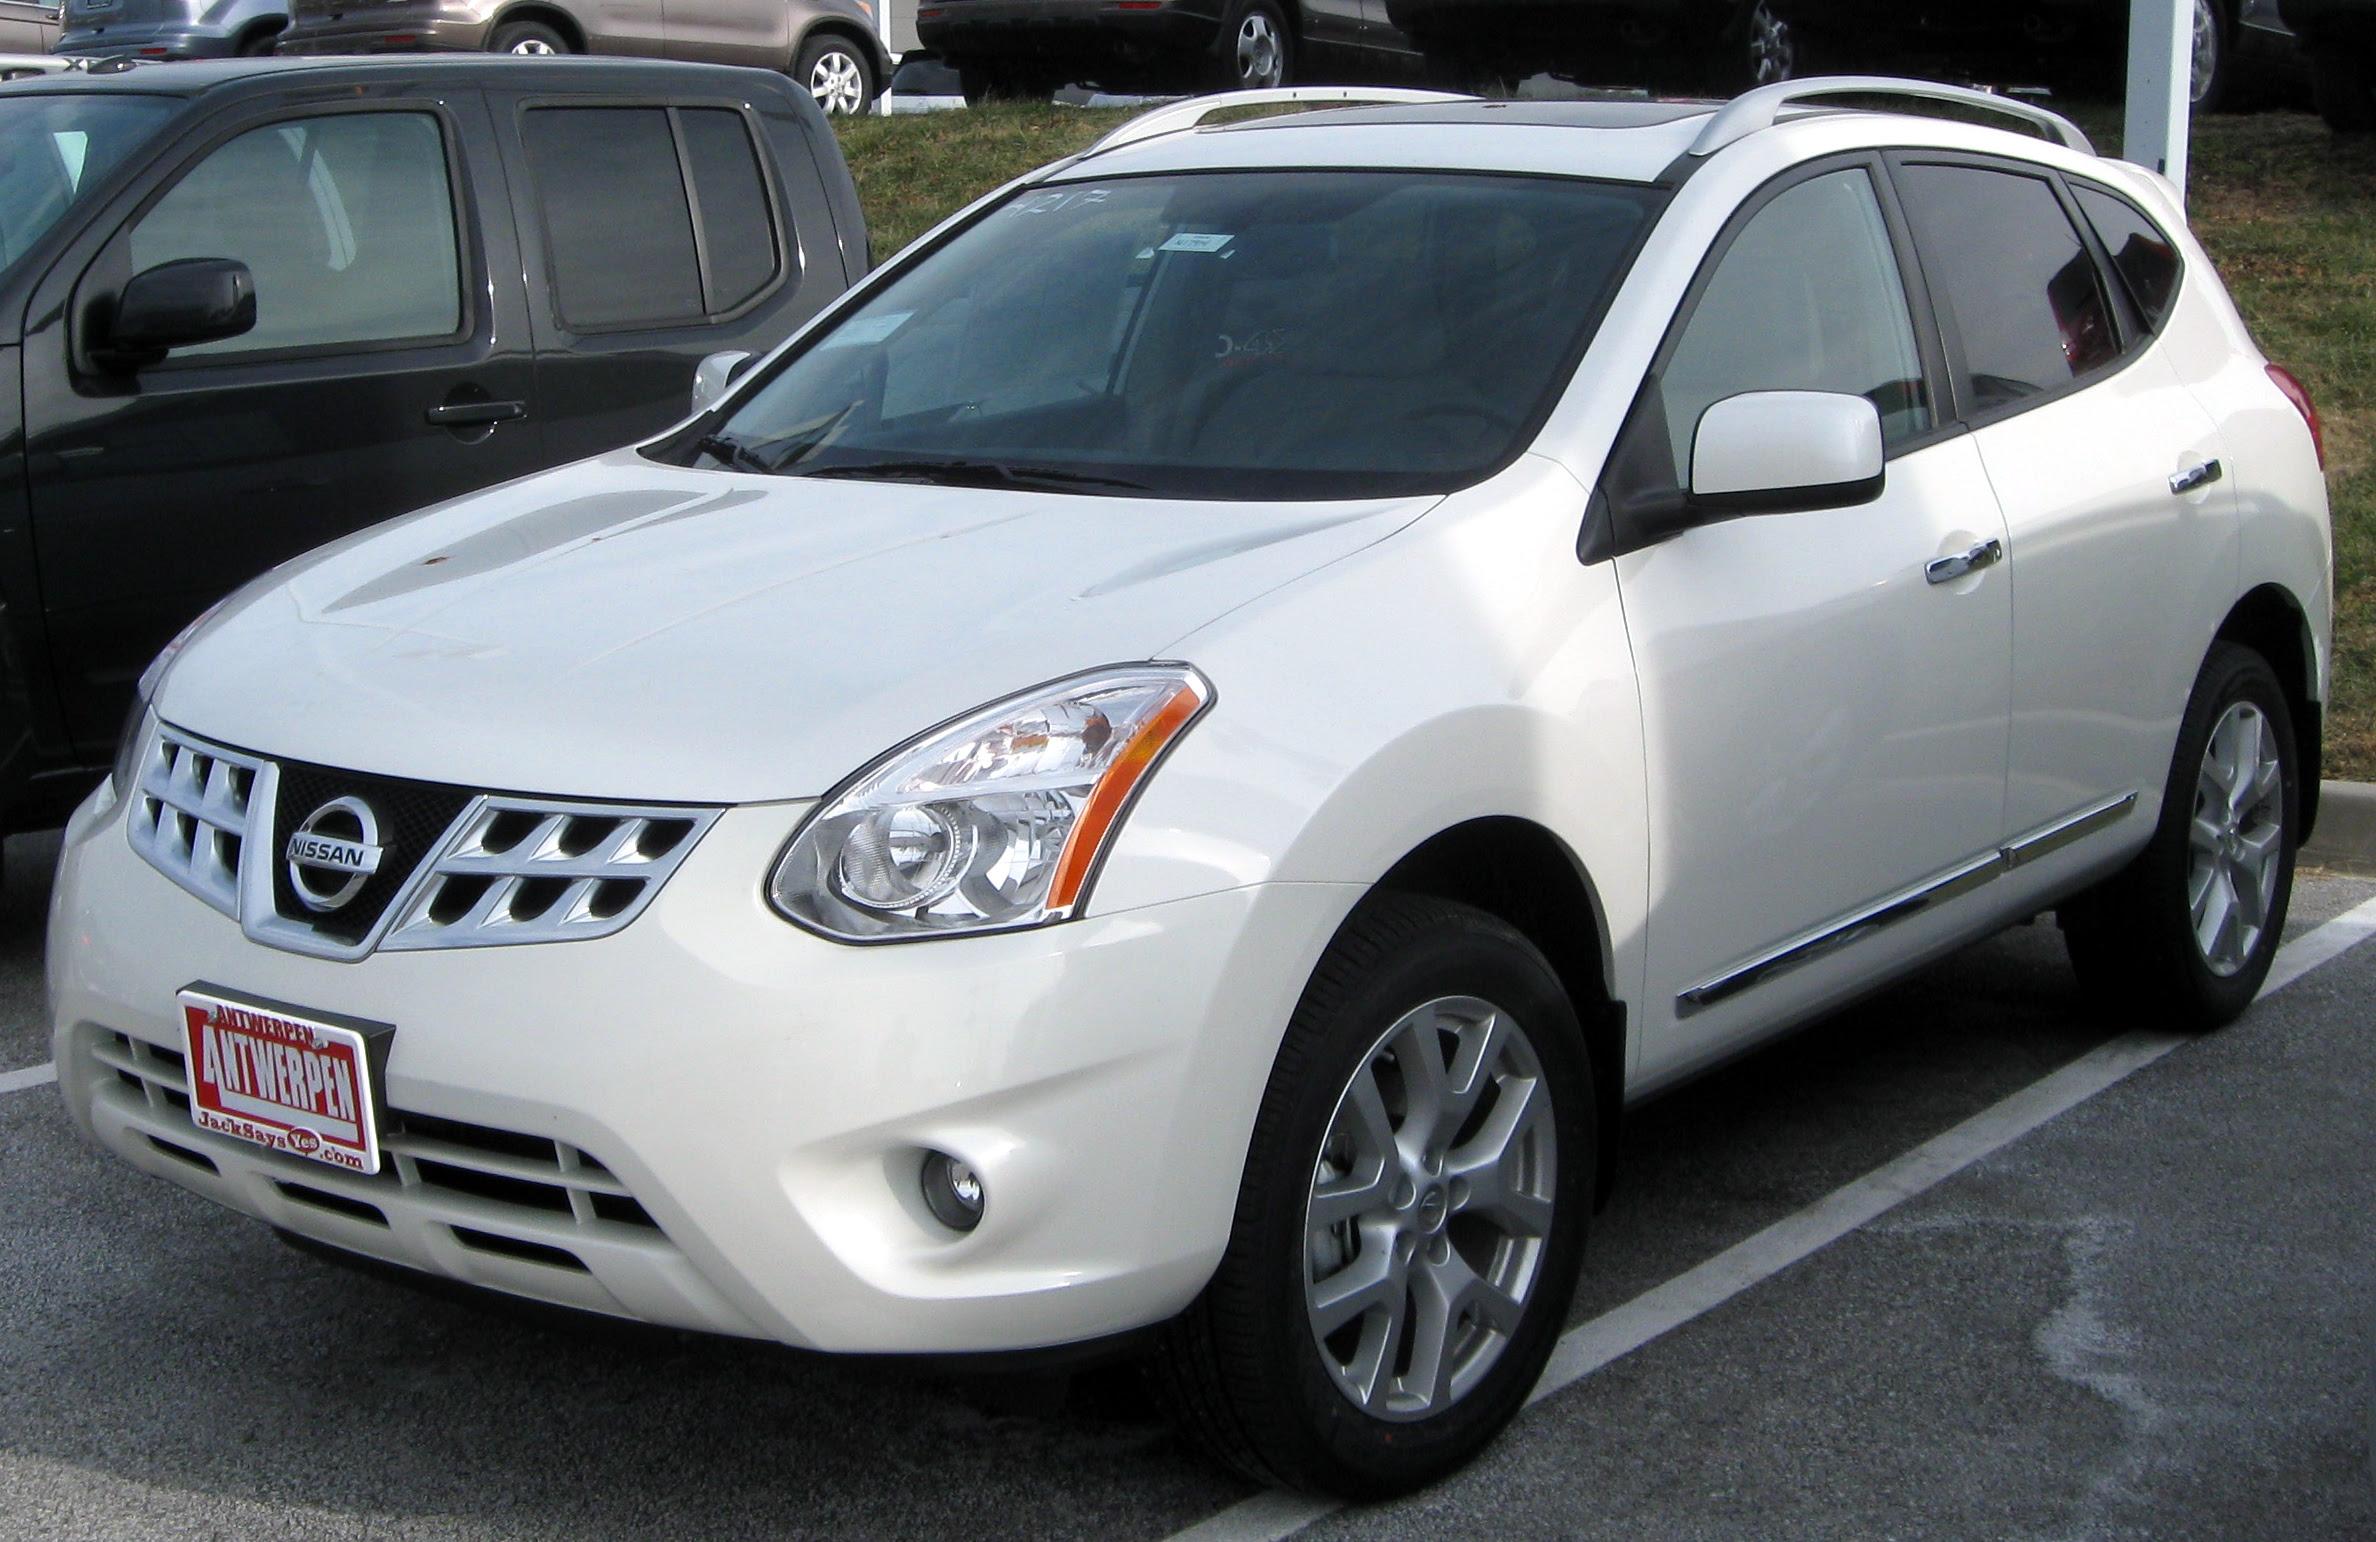 File:2011 Nissan Rogue SV -- 12-31-2010.jpg